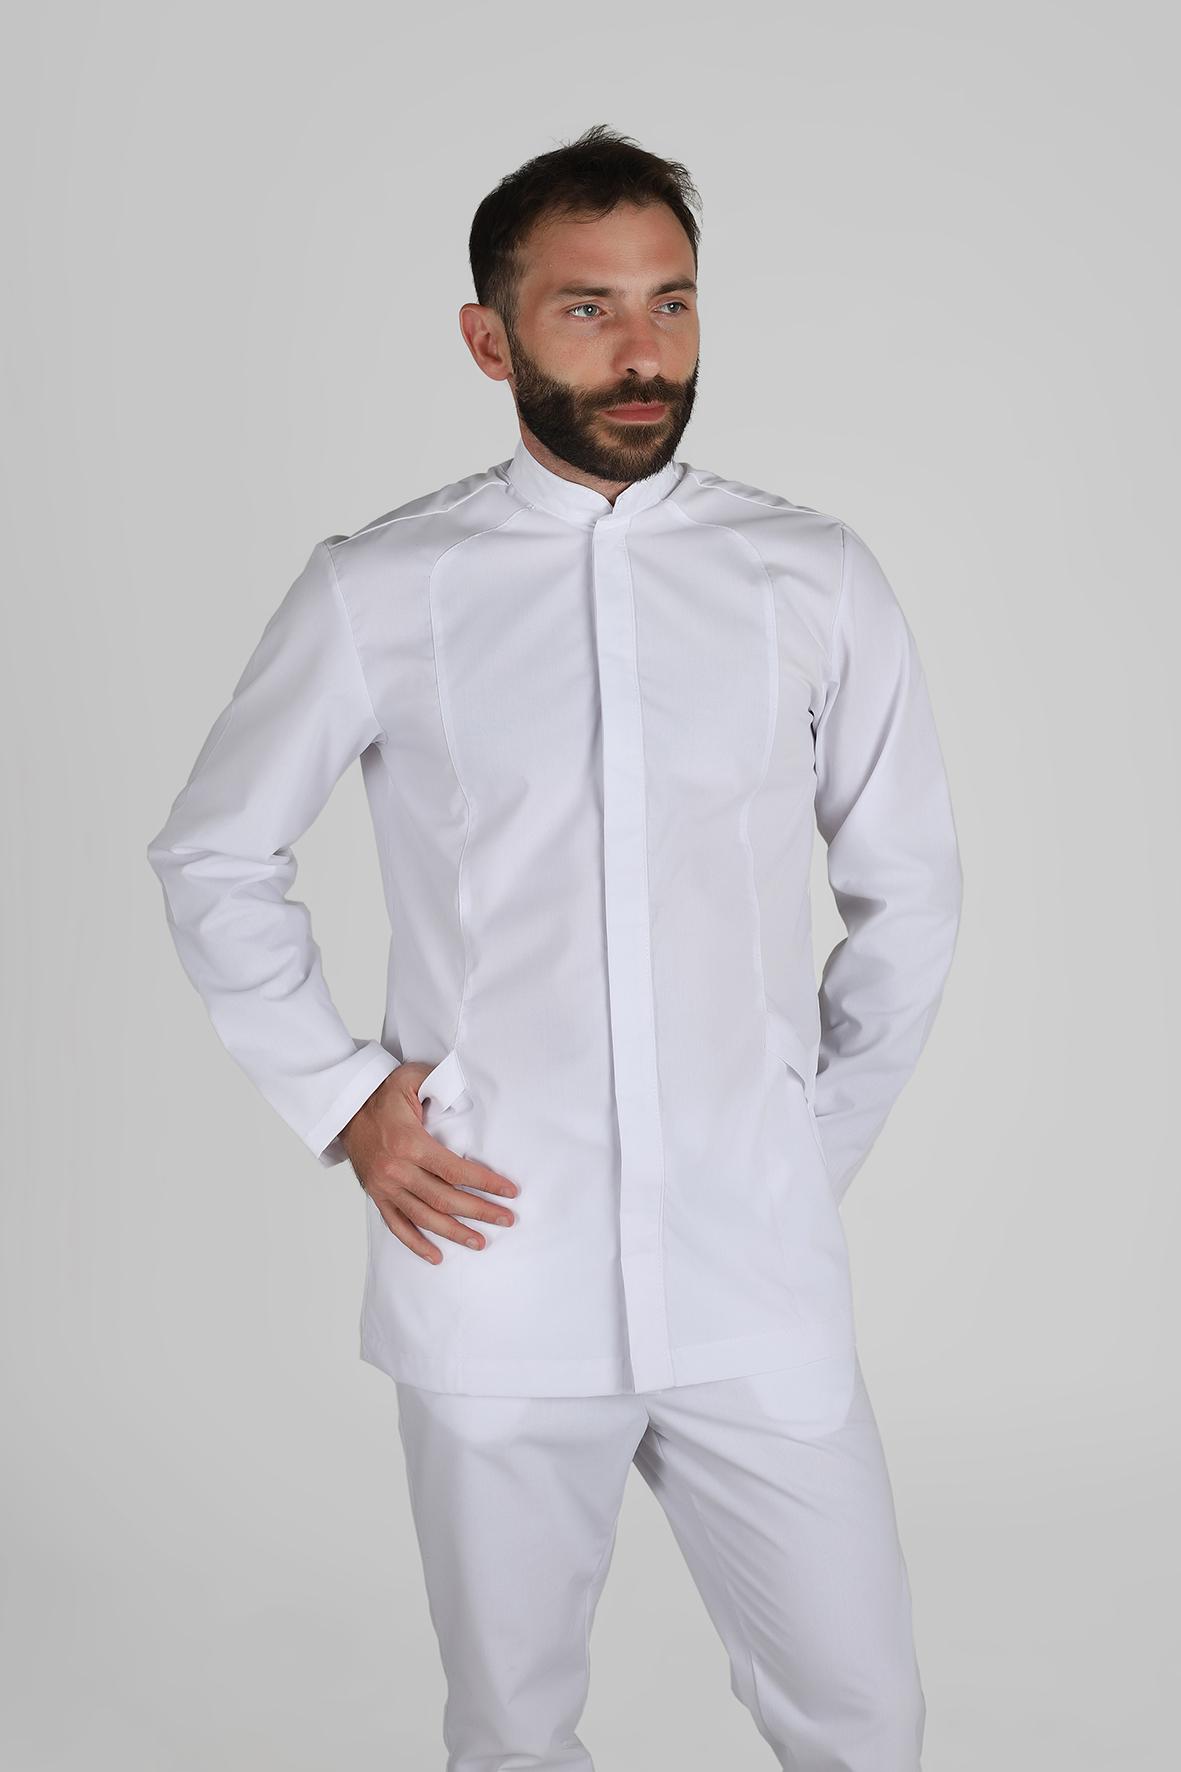 uniformes salud chaqueta prince